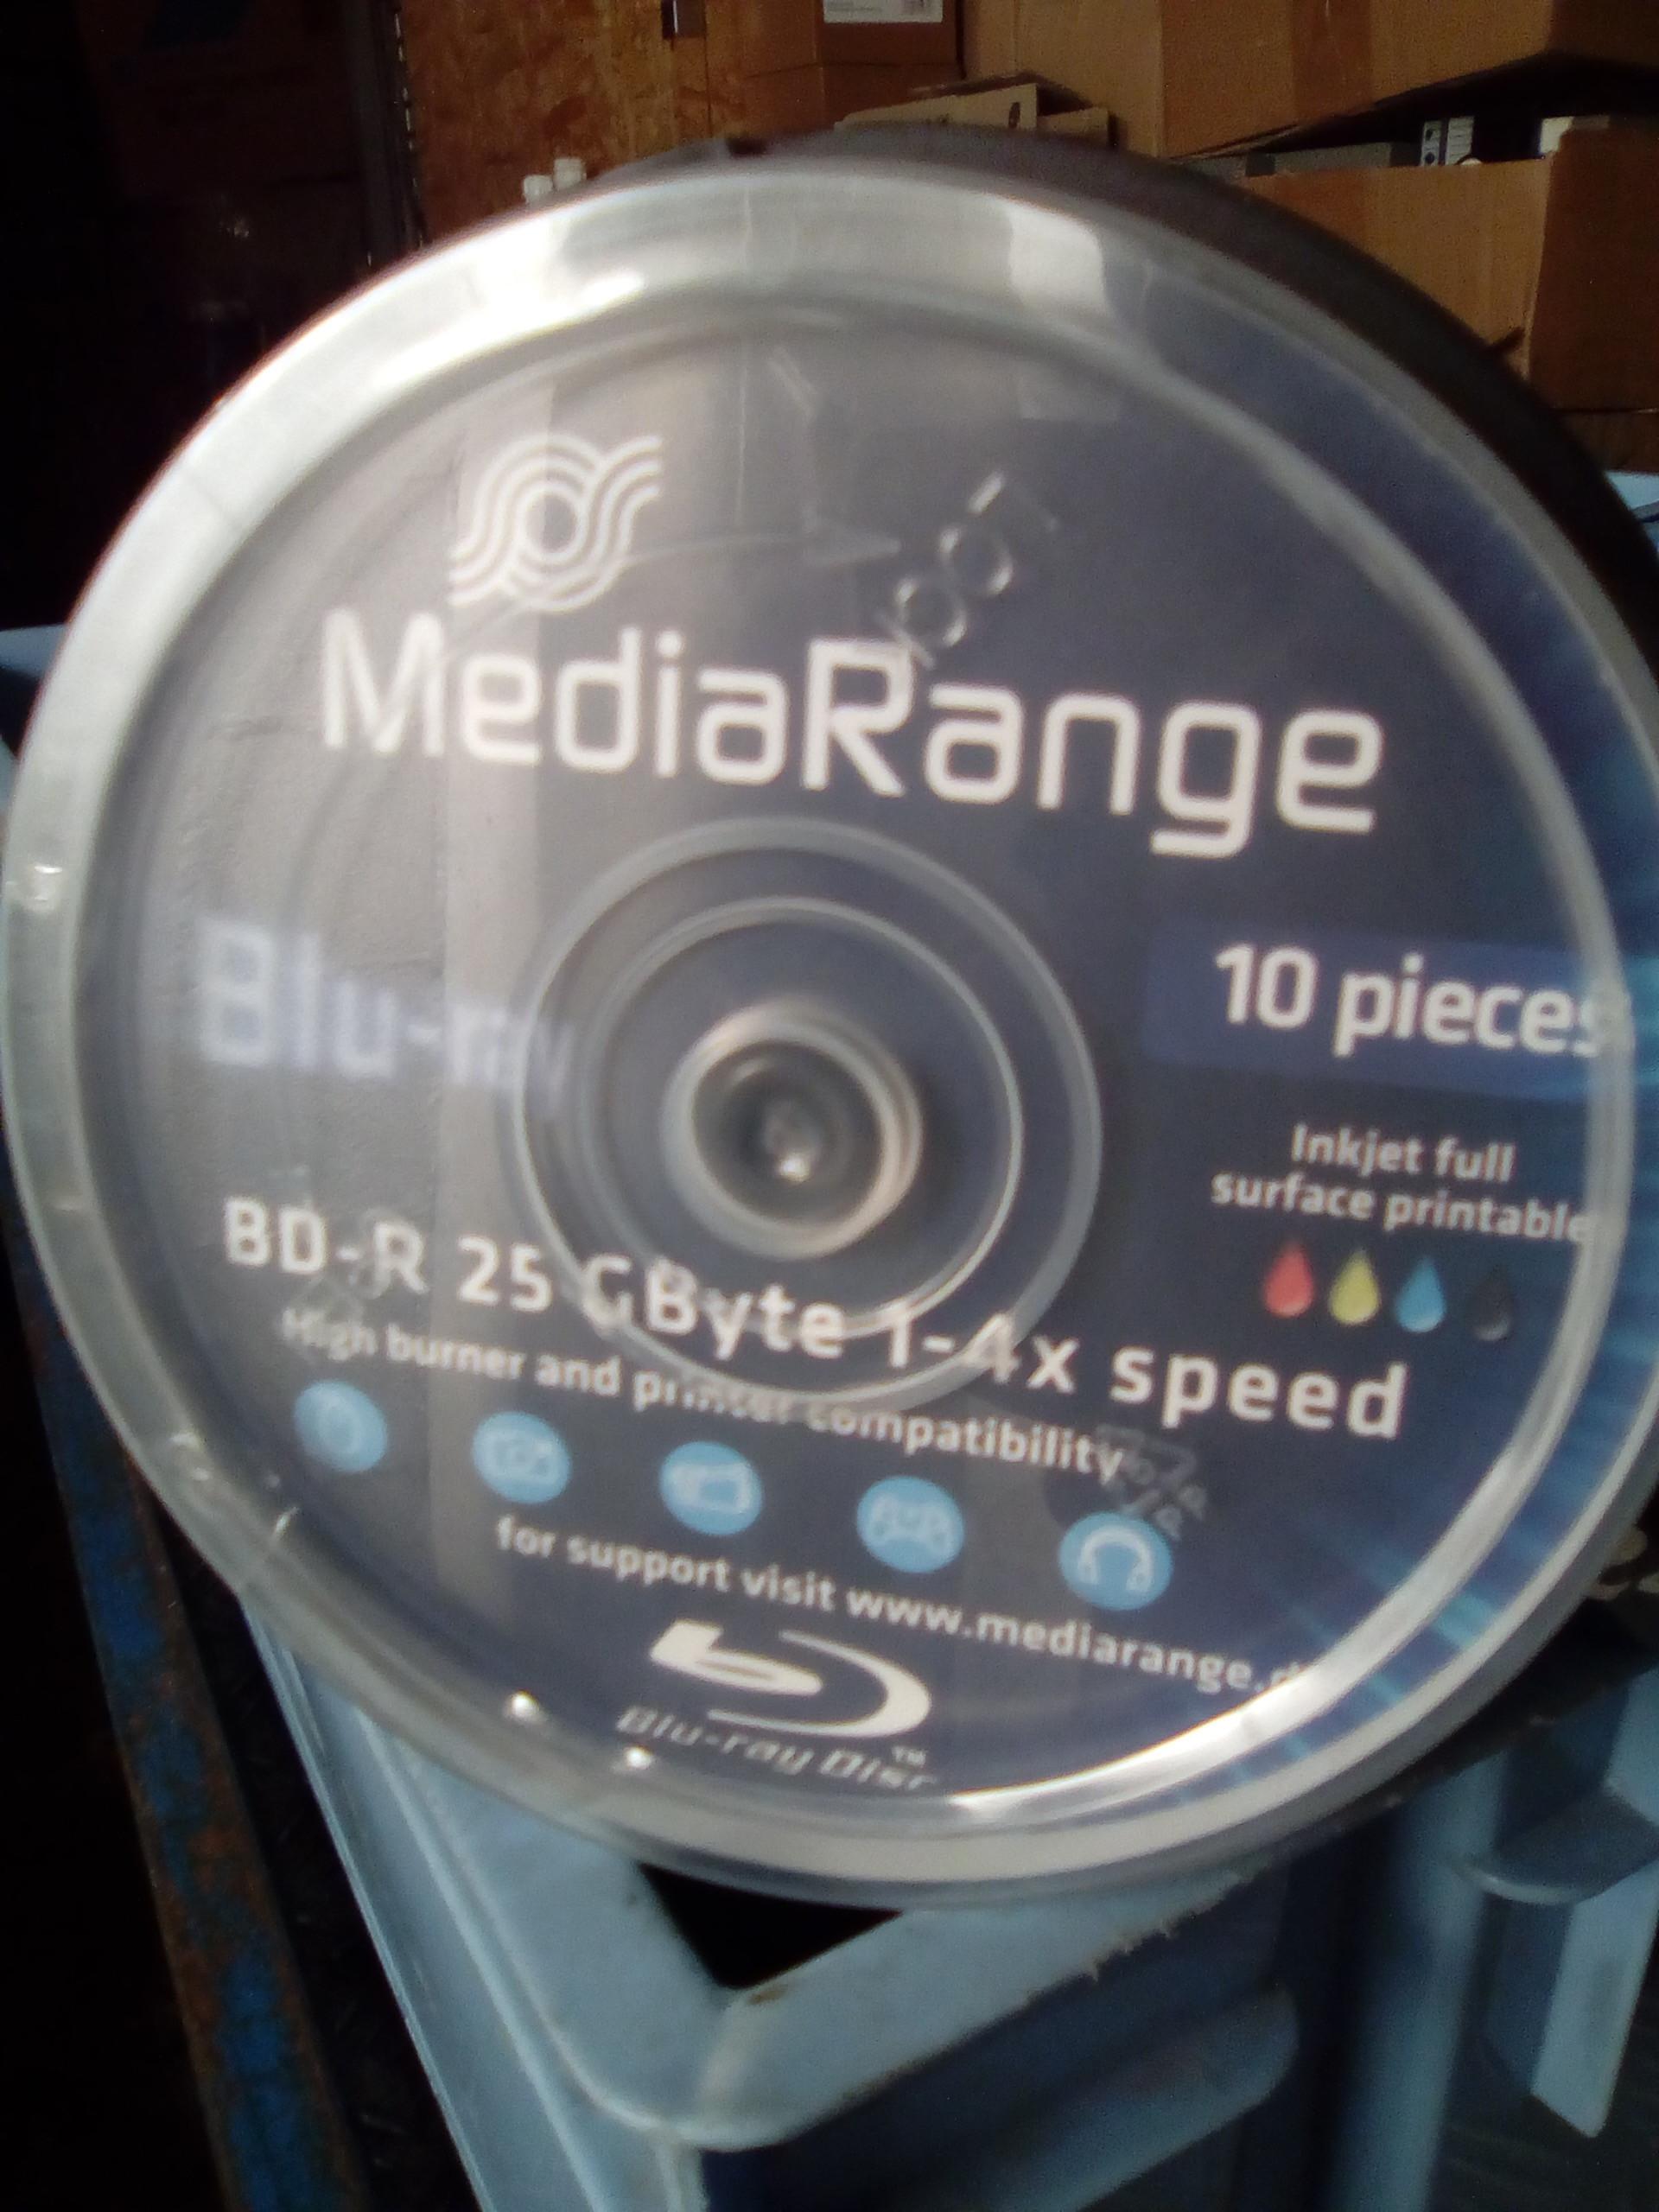 DVD enregistrable BluRay printable